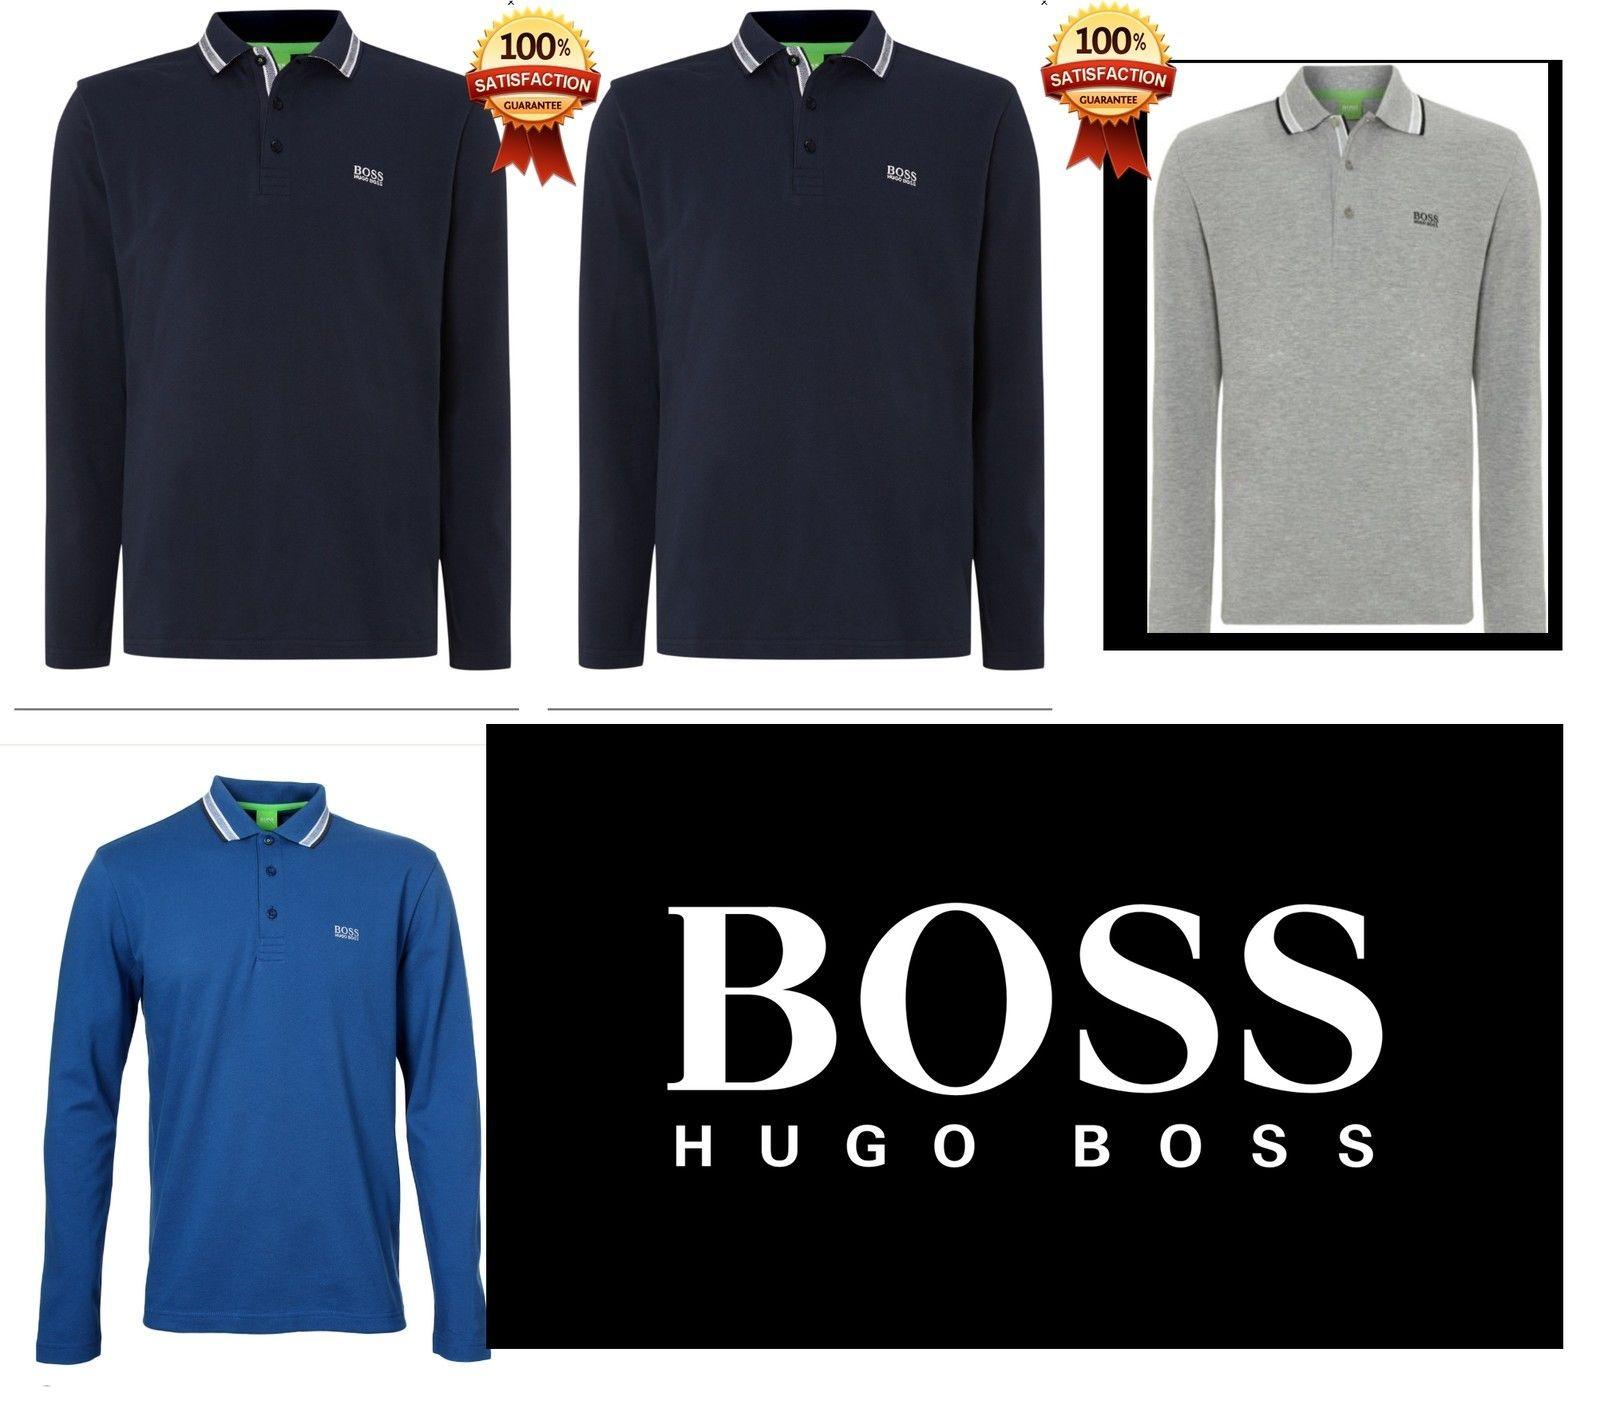 Hugo Boss Long Sleeve Polo Shirt for Men Blue Black Grey White S M L XL XXL